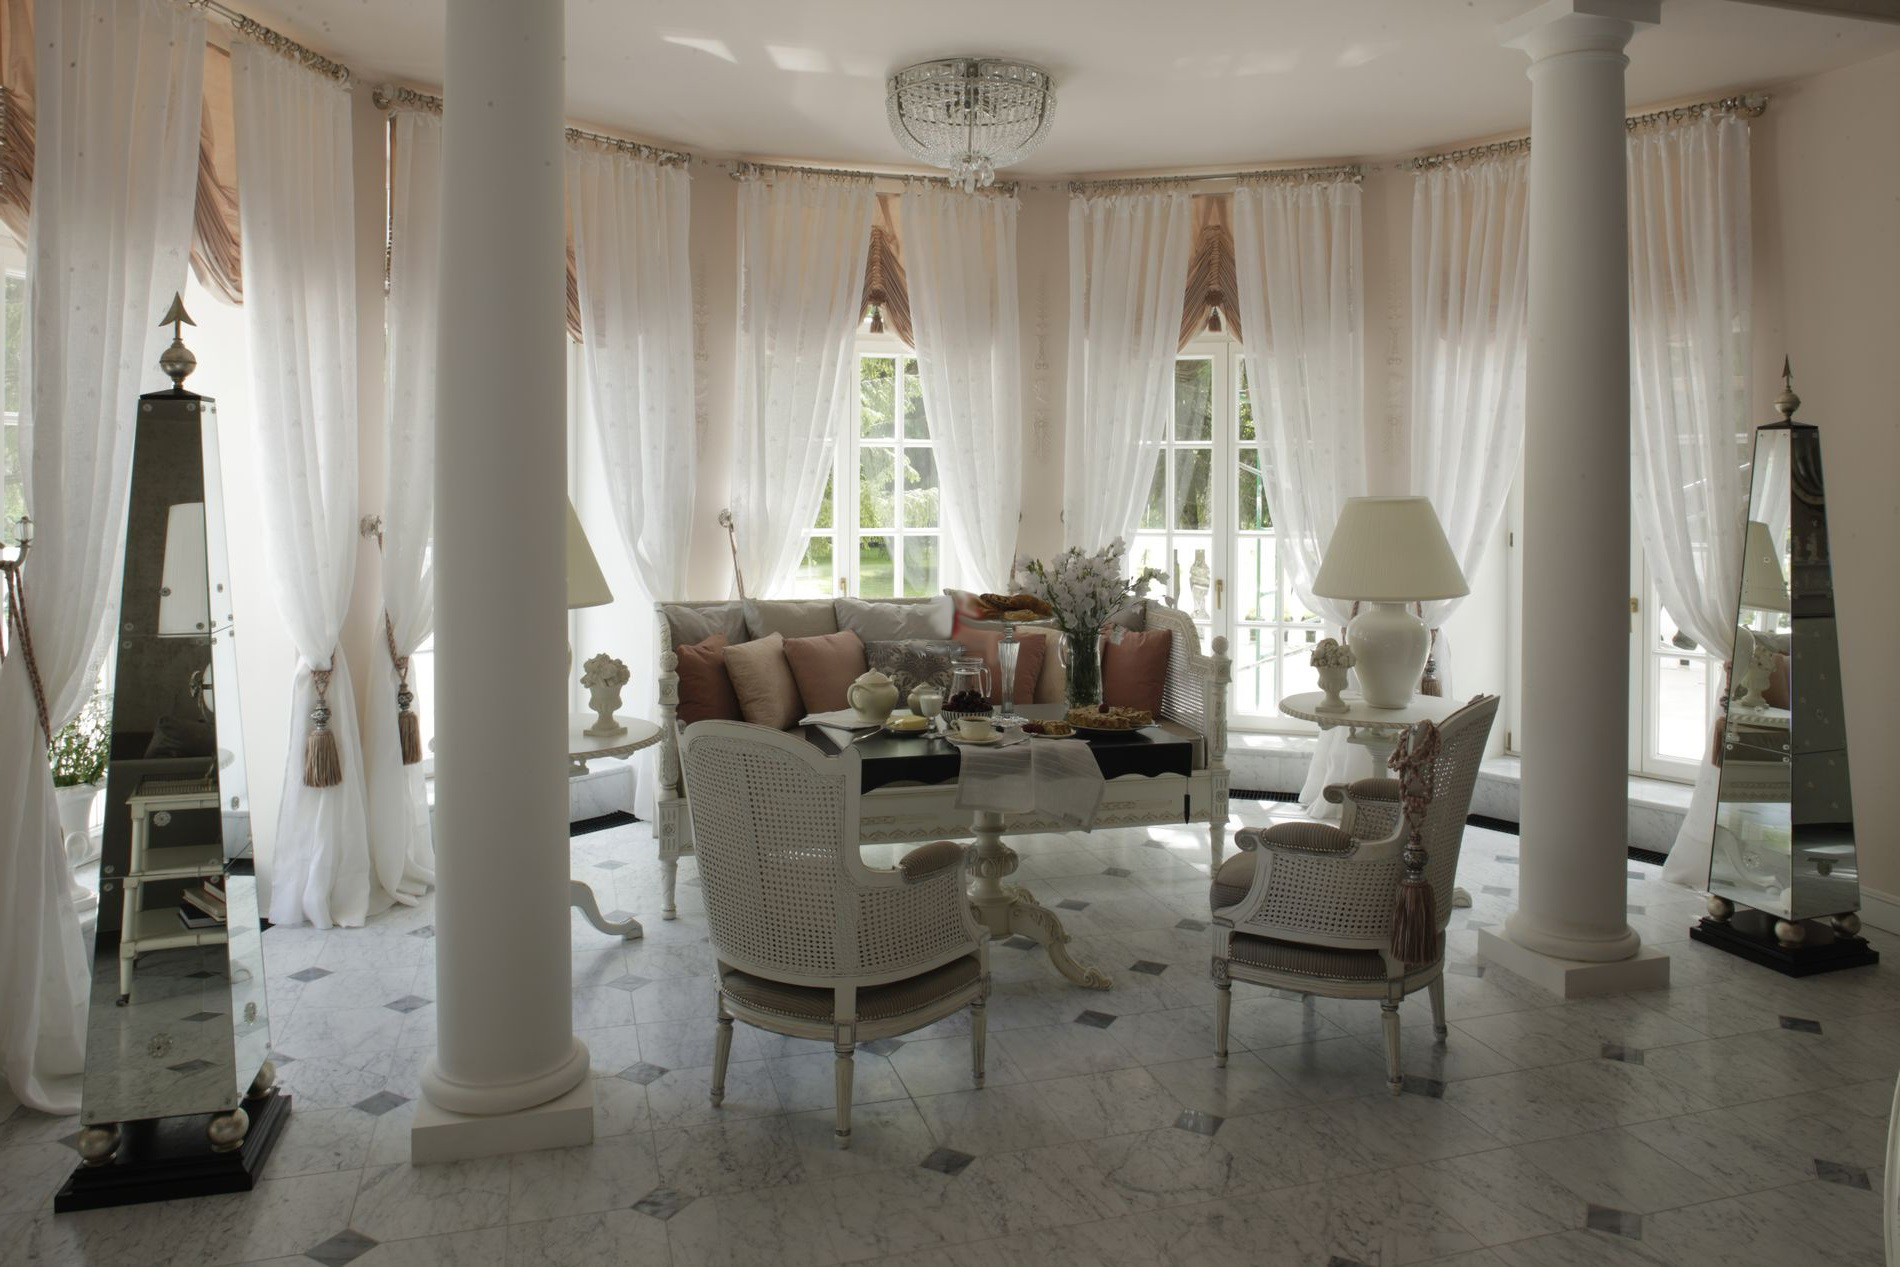 fransk-stil-i-interiør-3